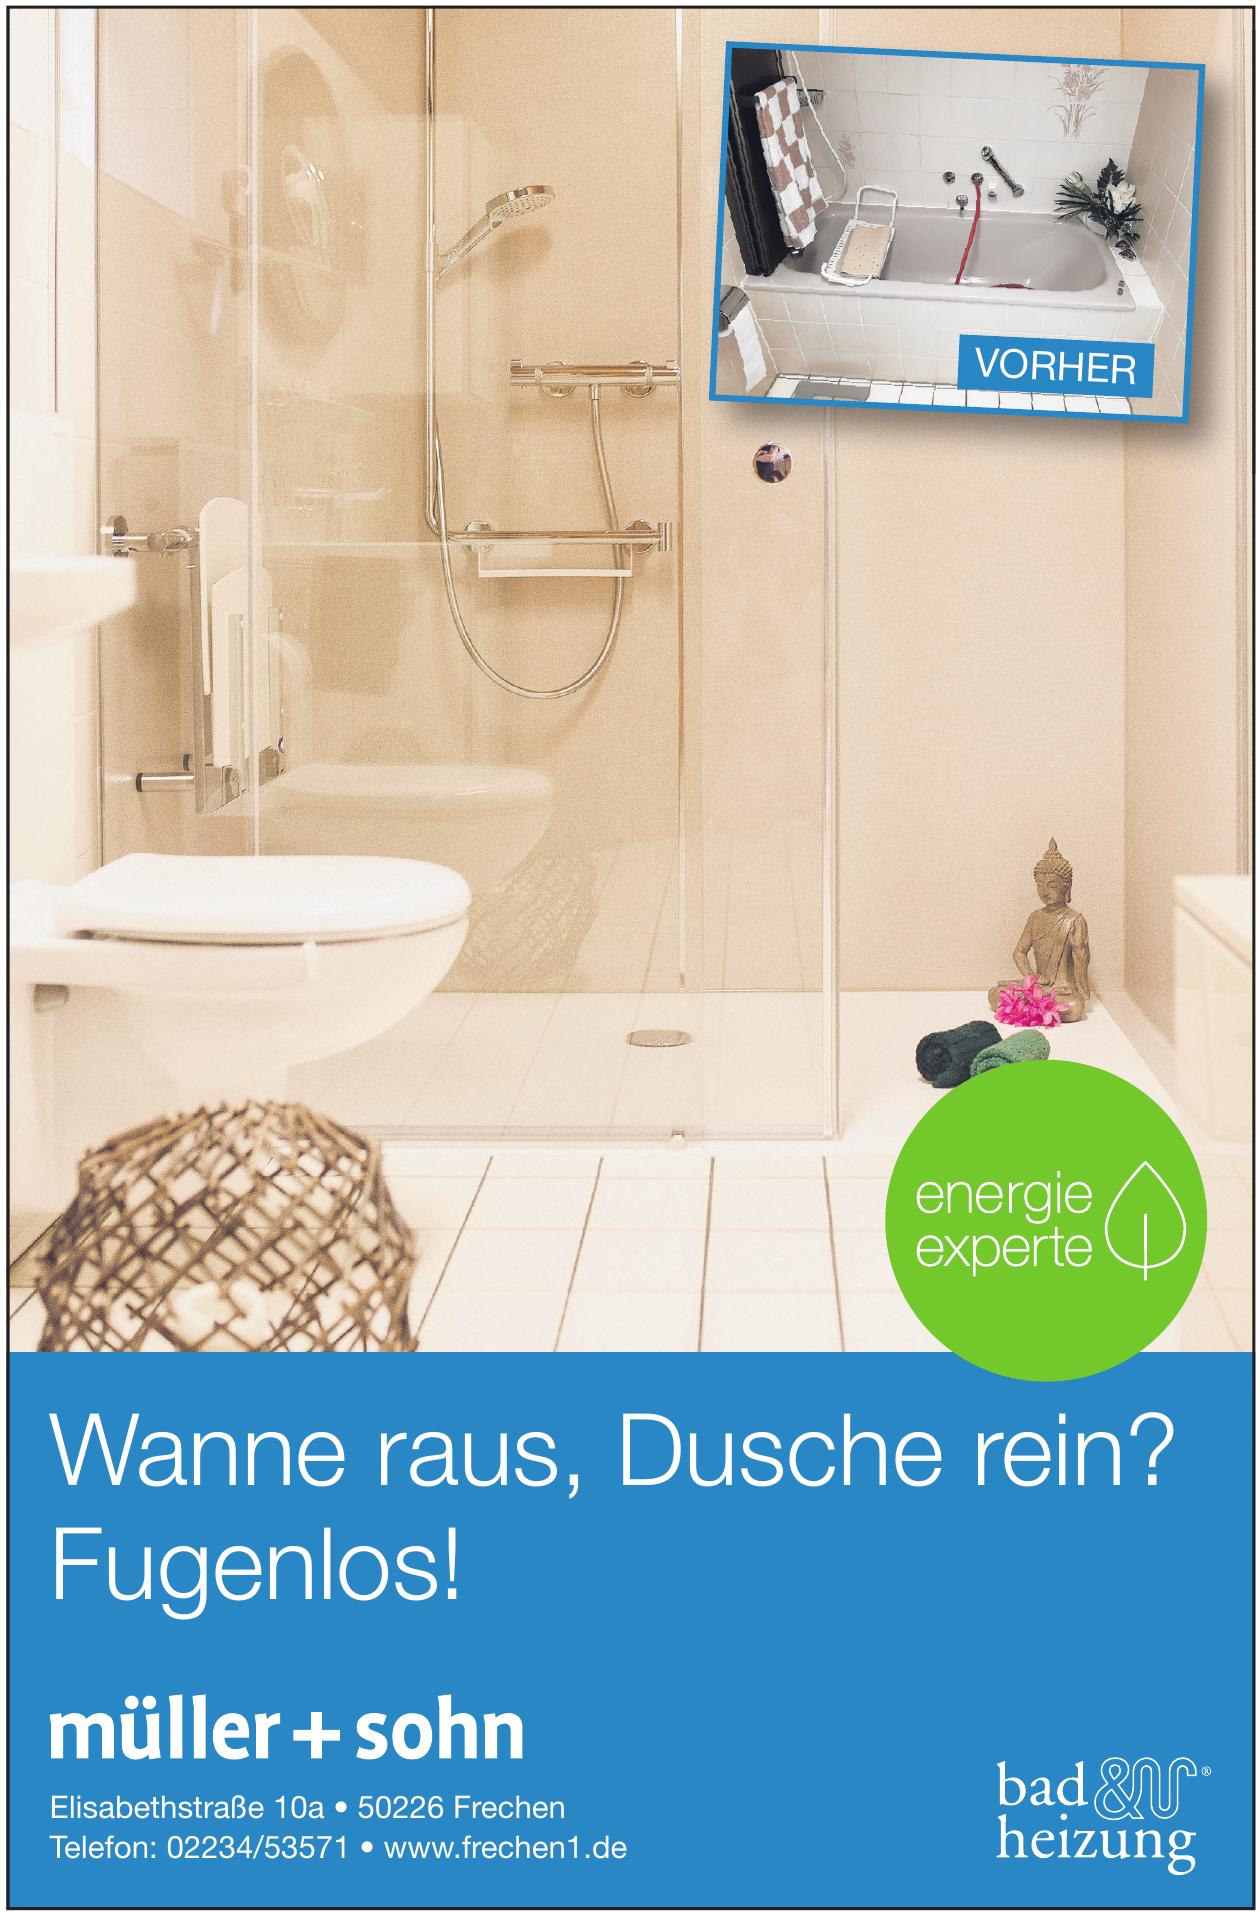 müller + sohn bad + heizung GmbH